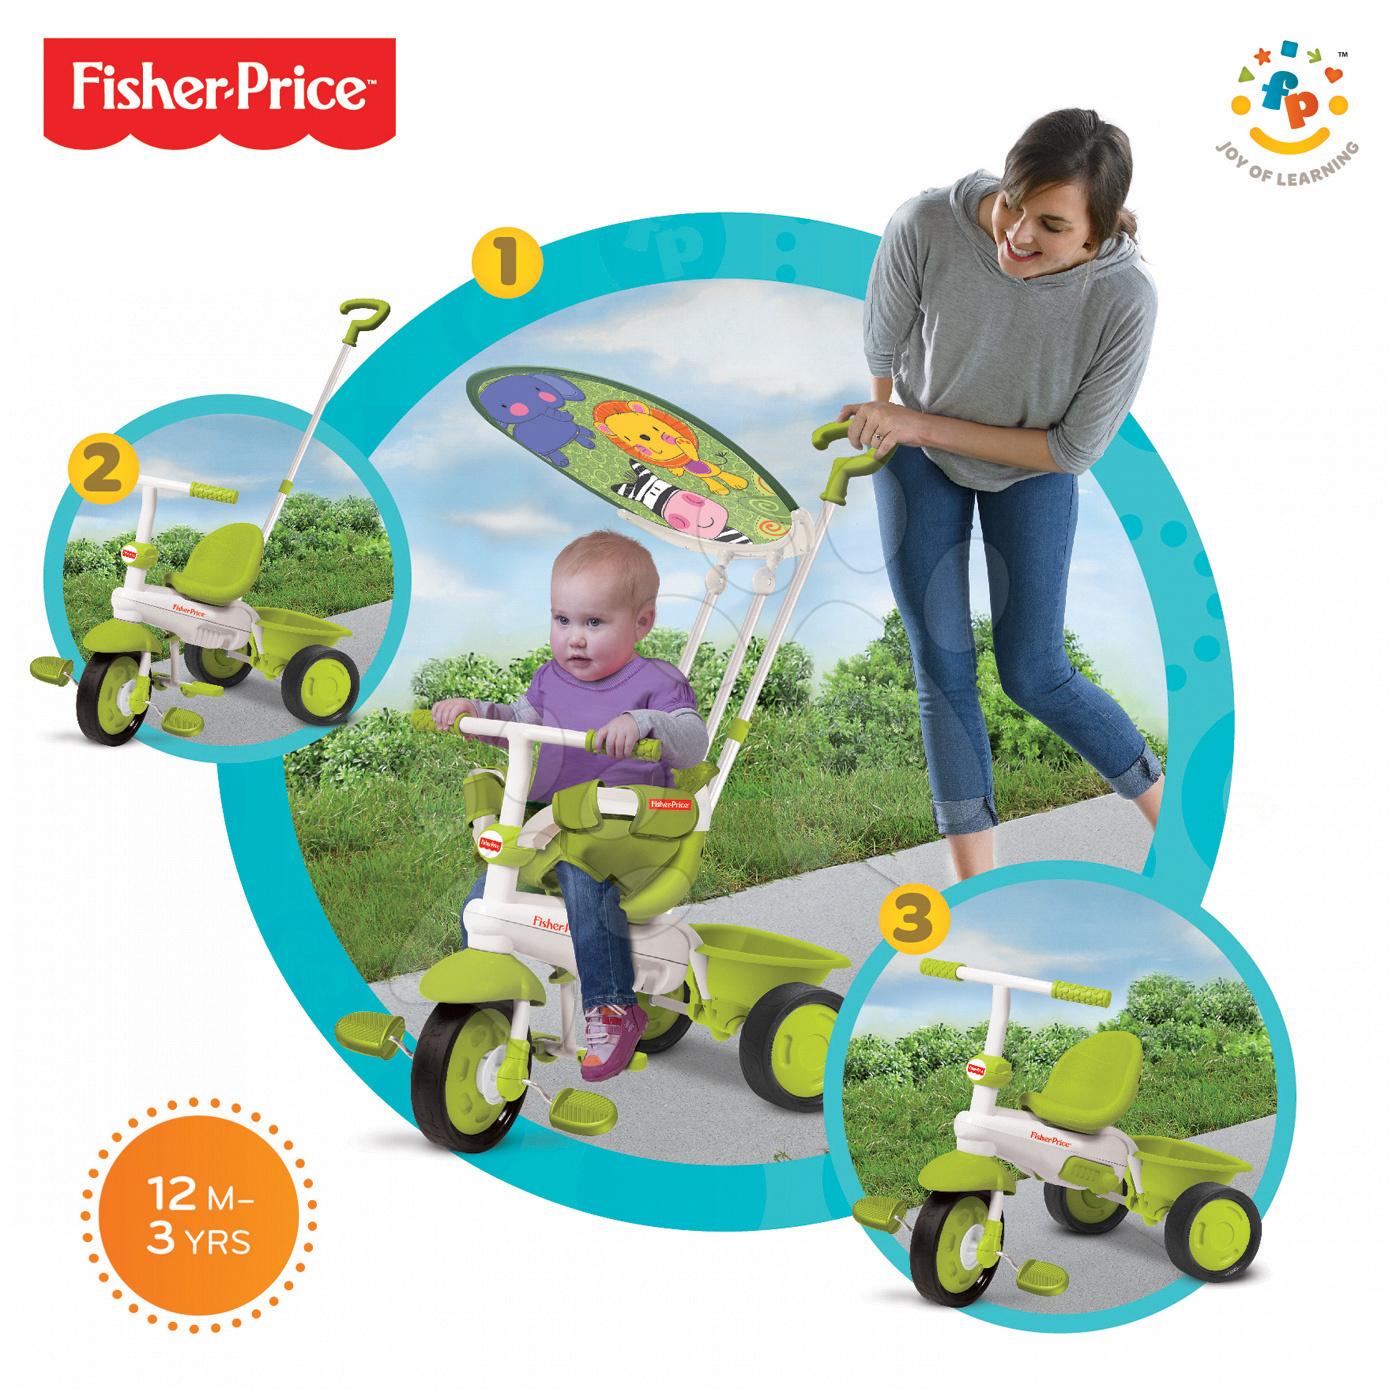 Trojkolka smarTrike Fisher-Price Classic Plus Green 1461133 zelená